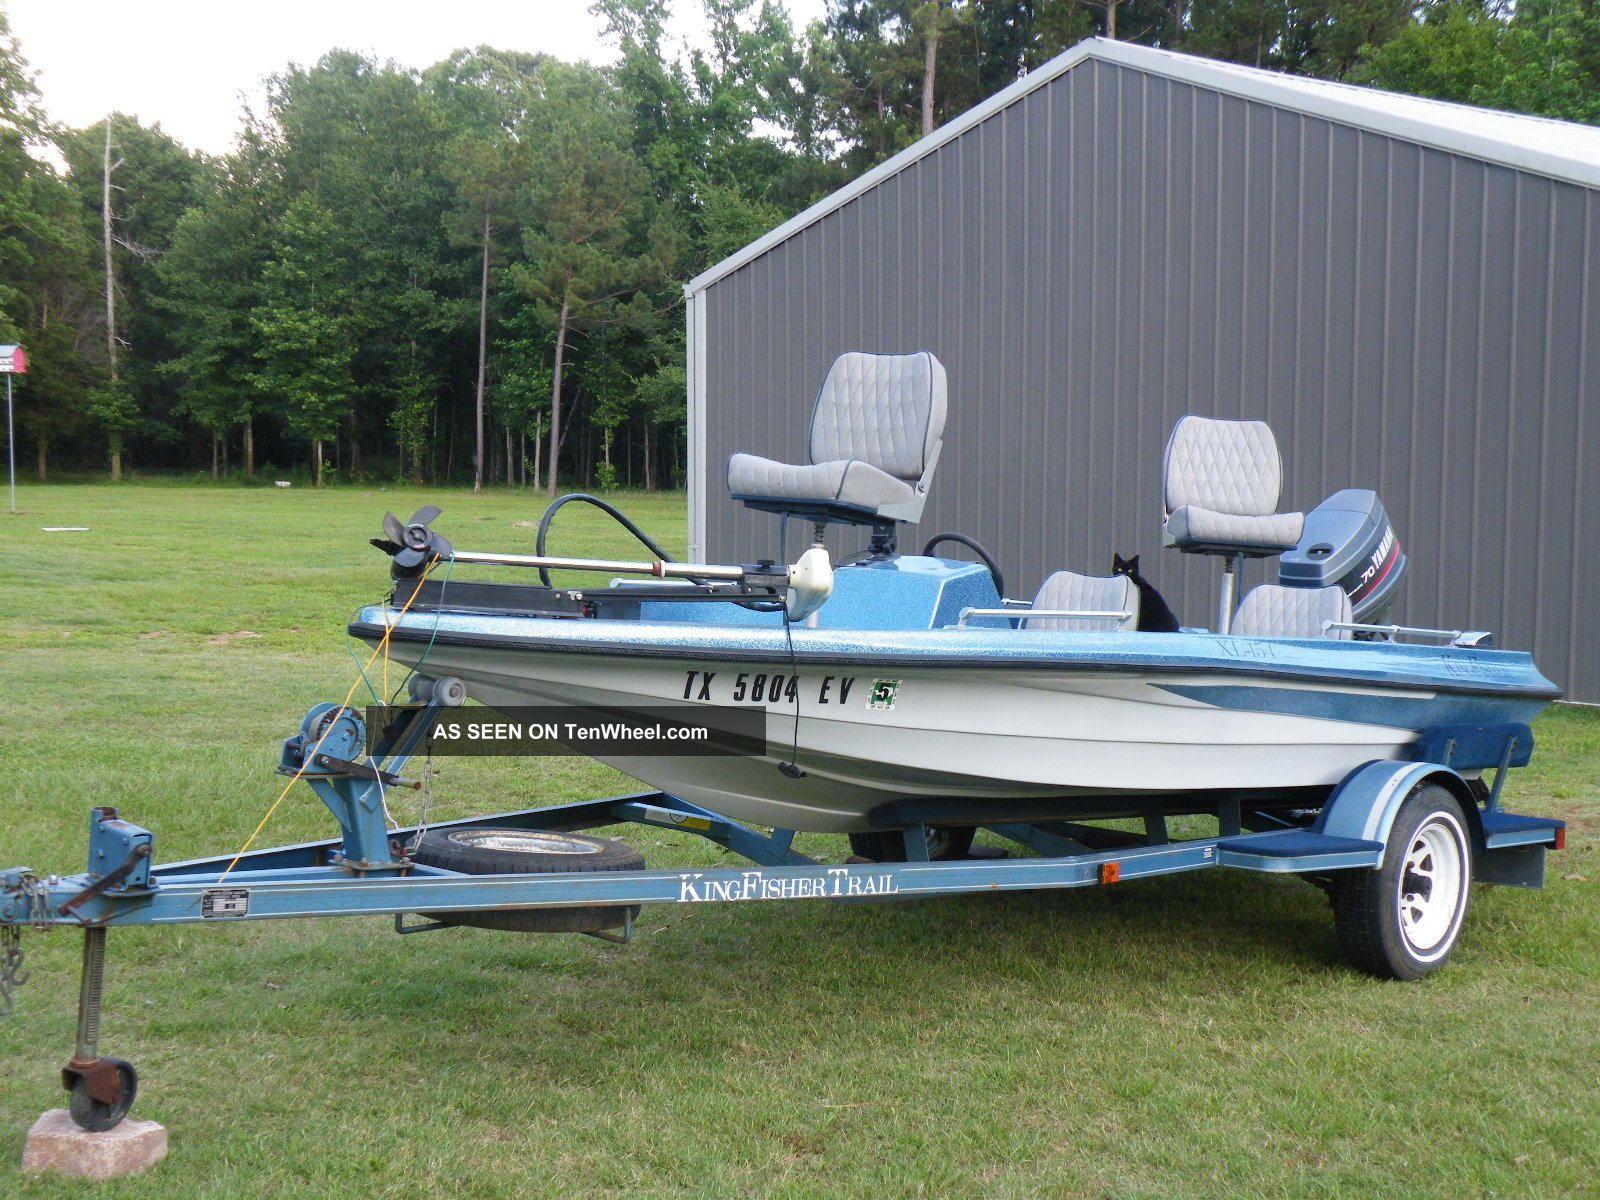 1991 Kingfisher Xl - 154 Bass Fishing Boats photo